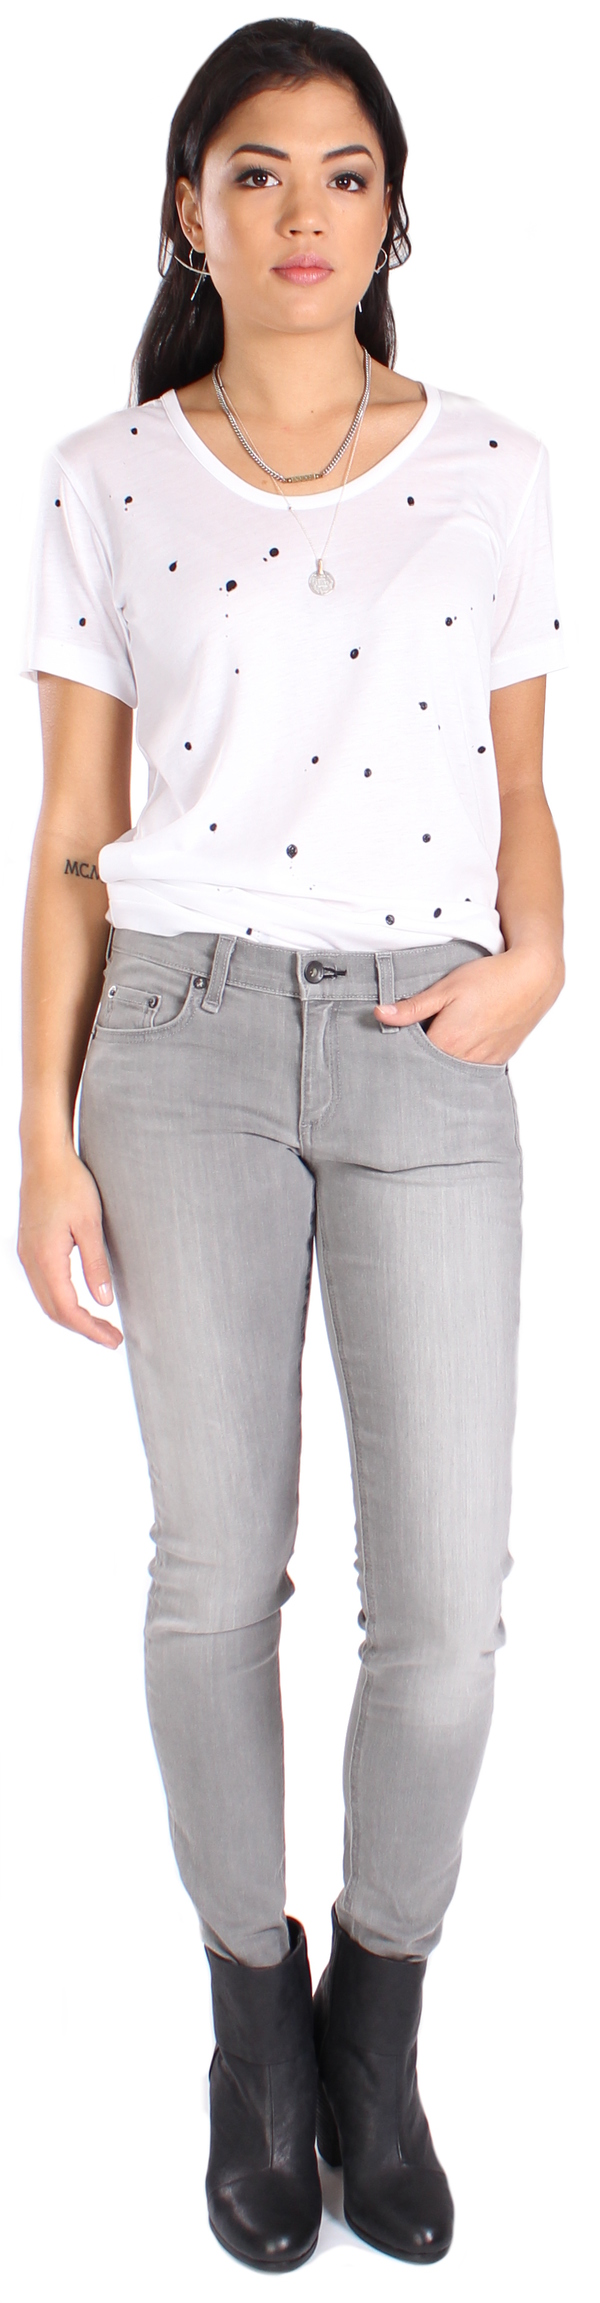 Rag & Bone Dre Jean in Aged Grey